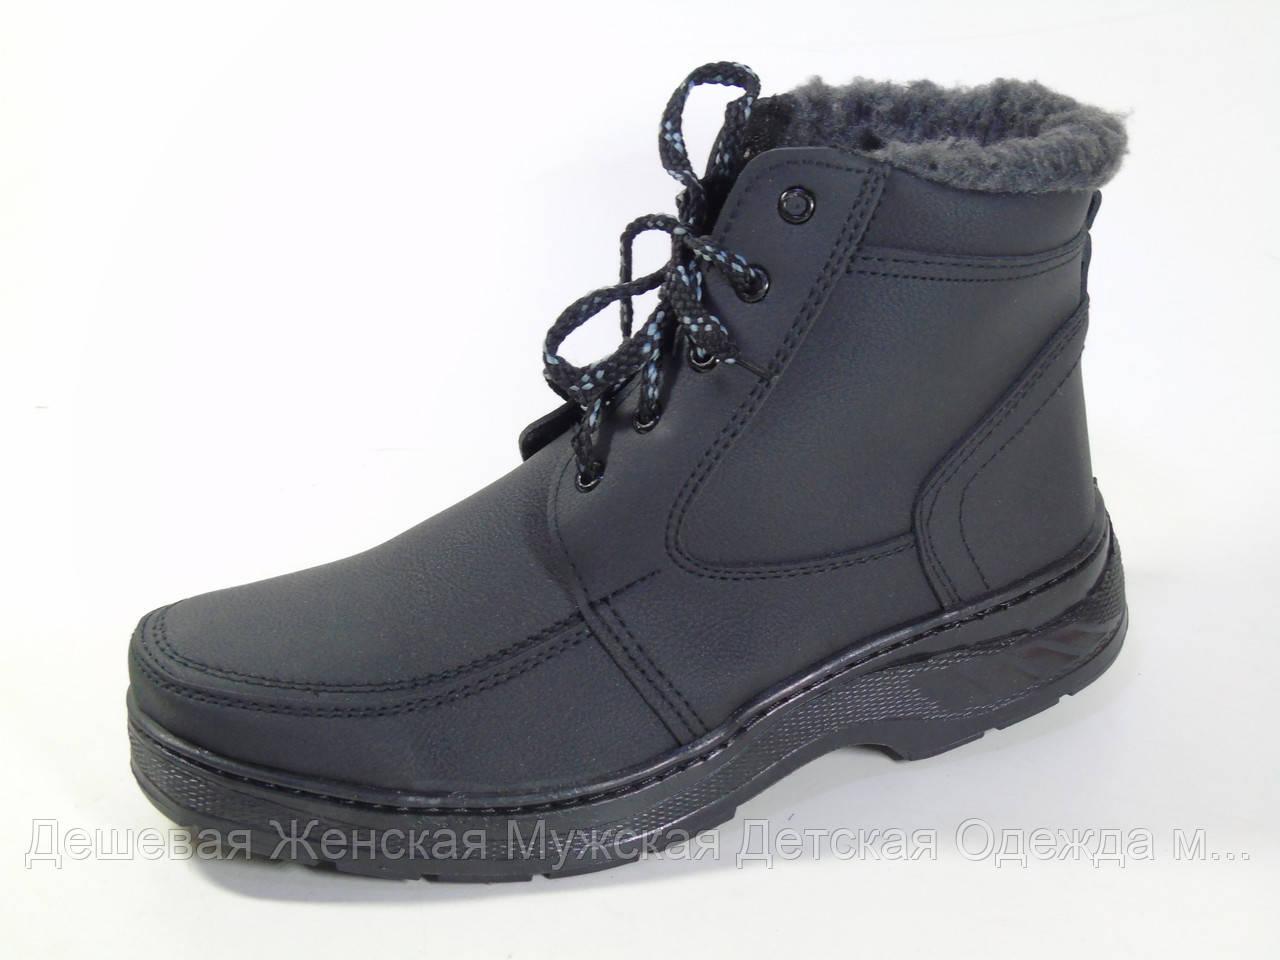 Ботинки мужские зима 40-45